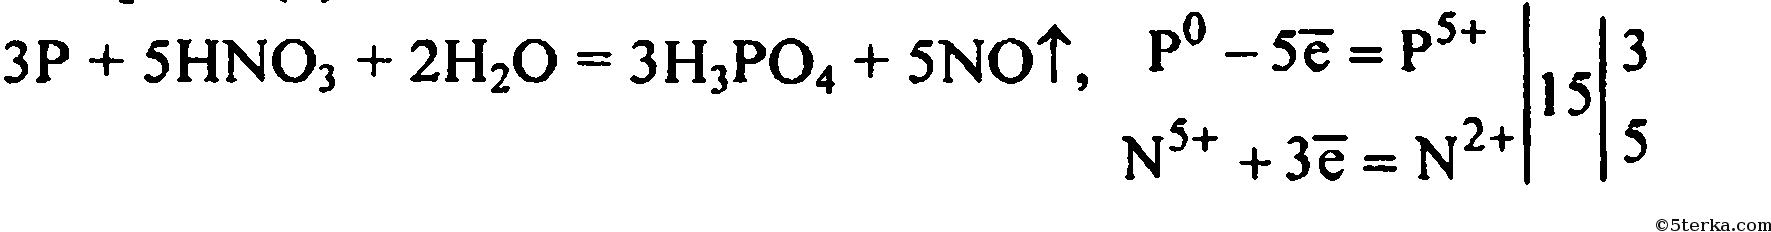 2 Напишите уравнения реакций,